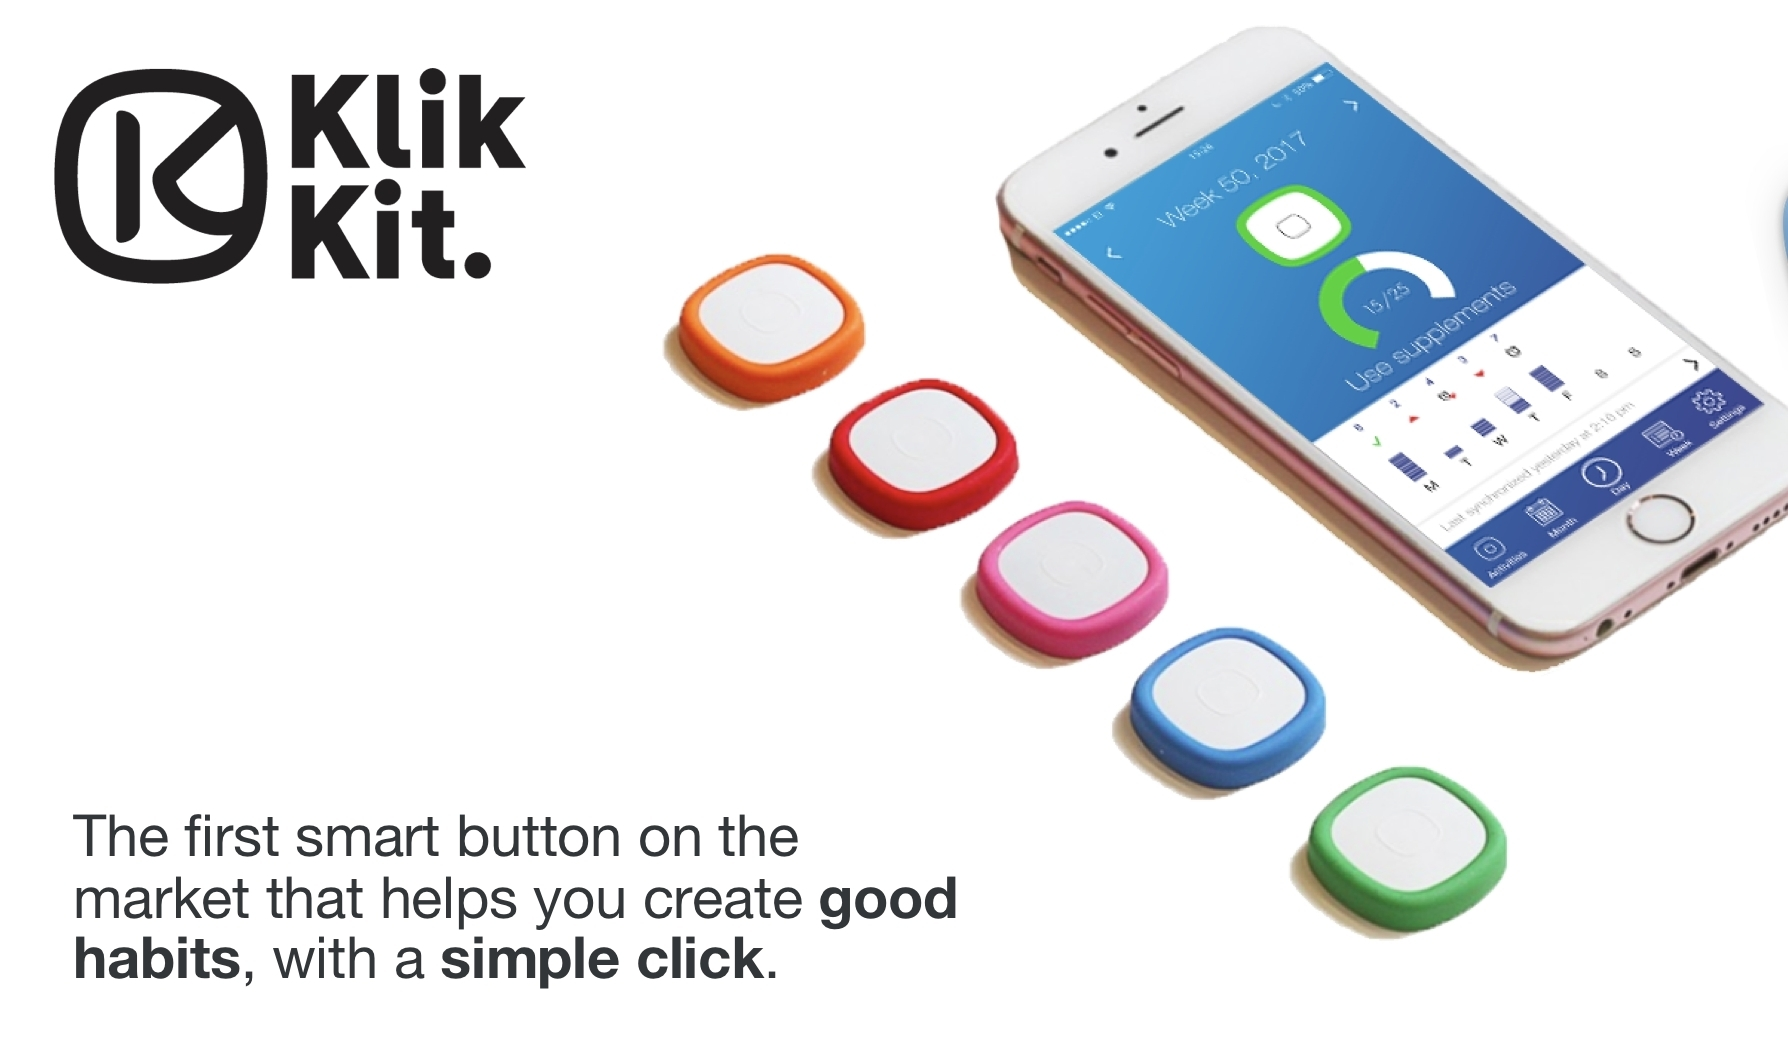 Groundbreaking Smart Button & Mobile Health App Klikkit